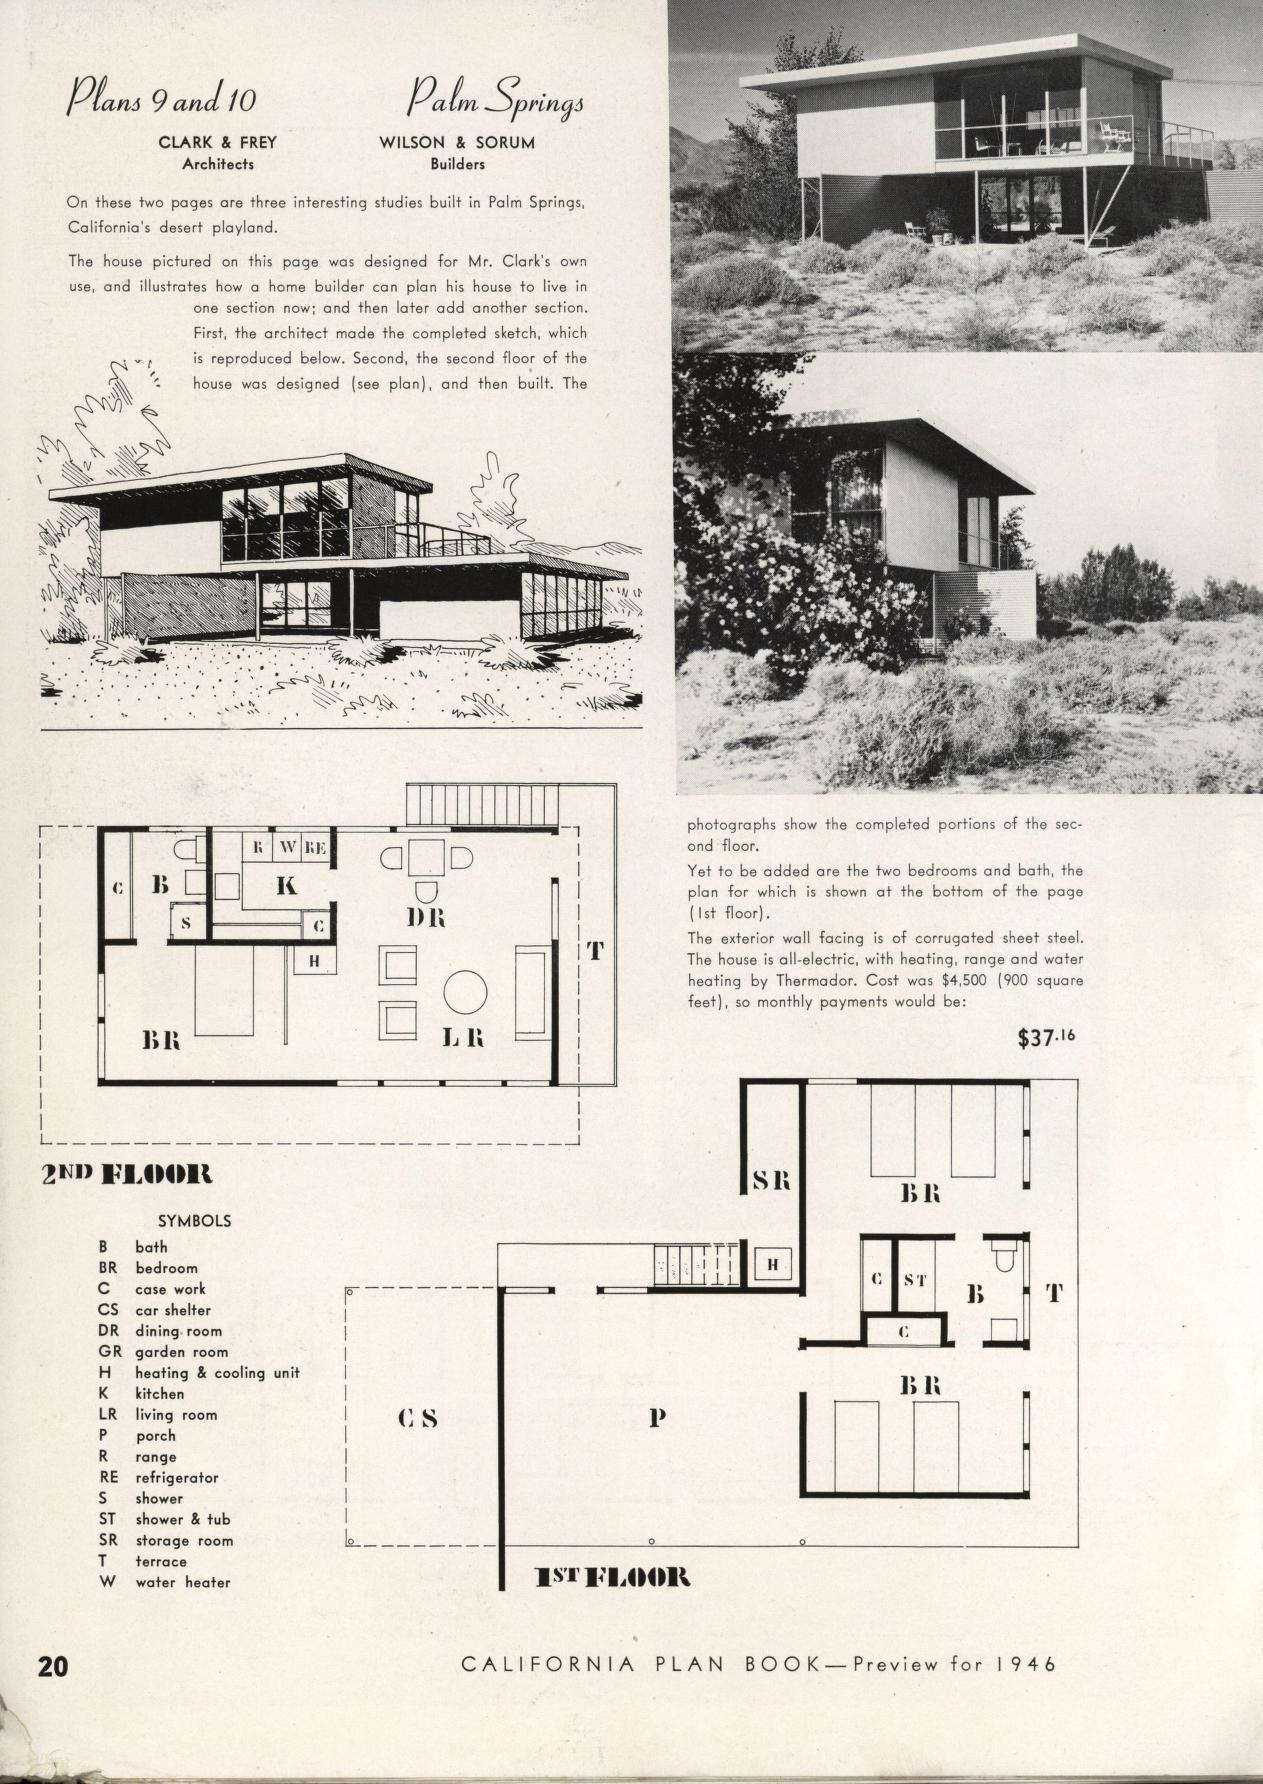 California plan book 1946 VinTagE HOUSE PlanS1940s